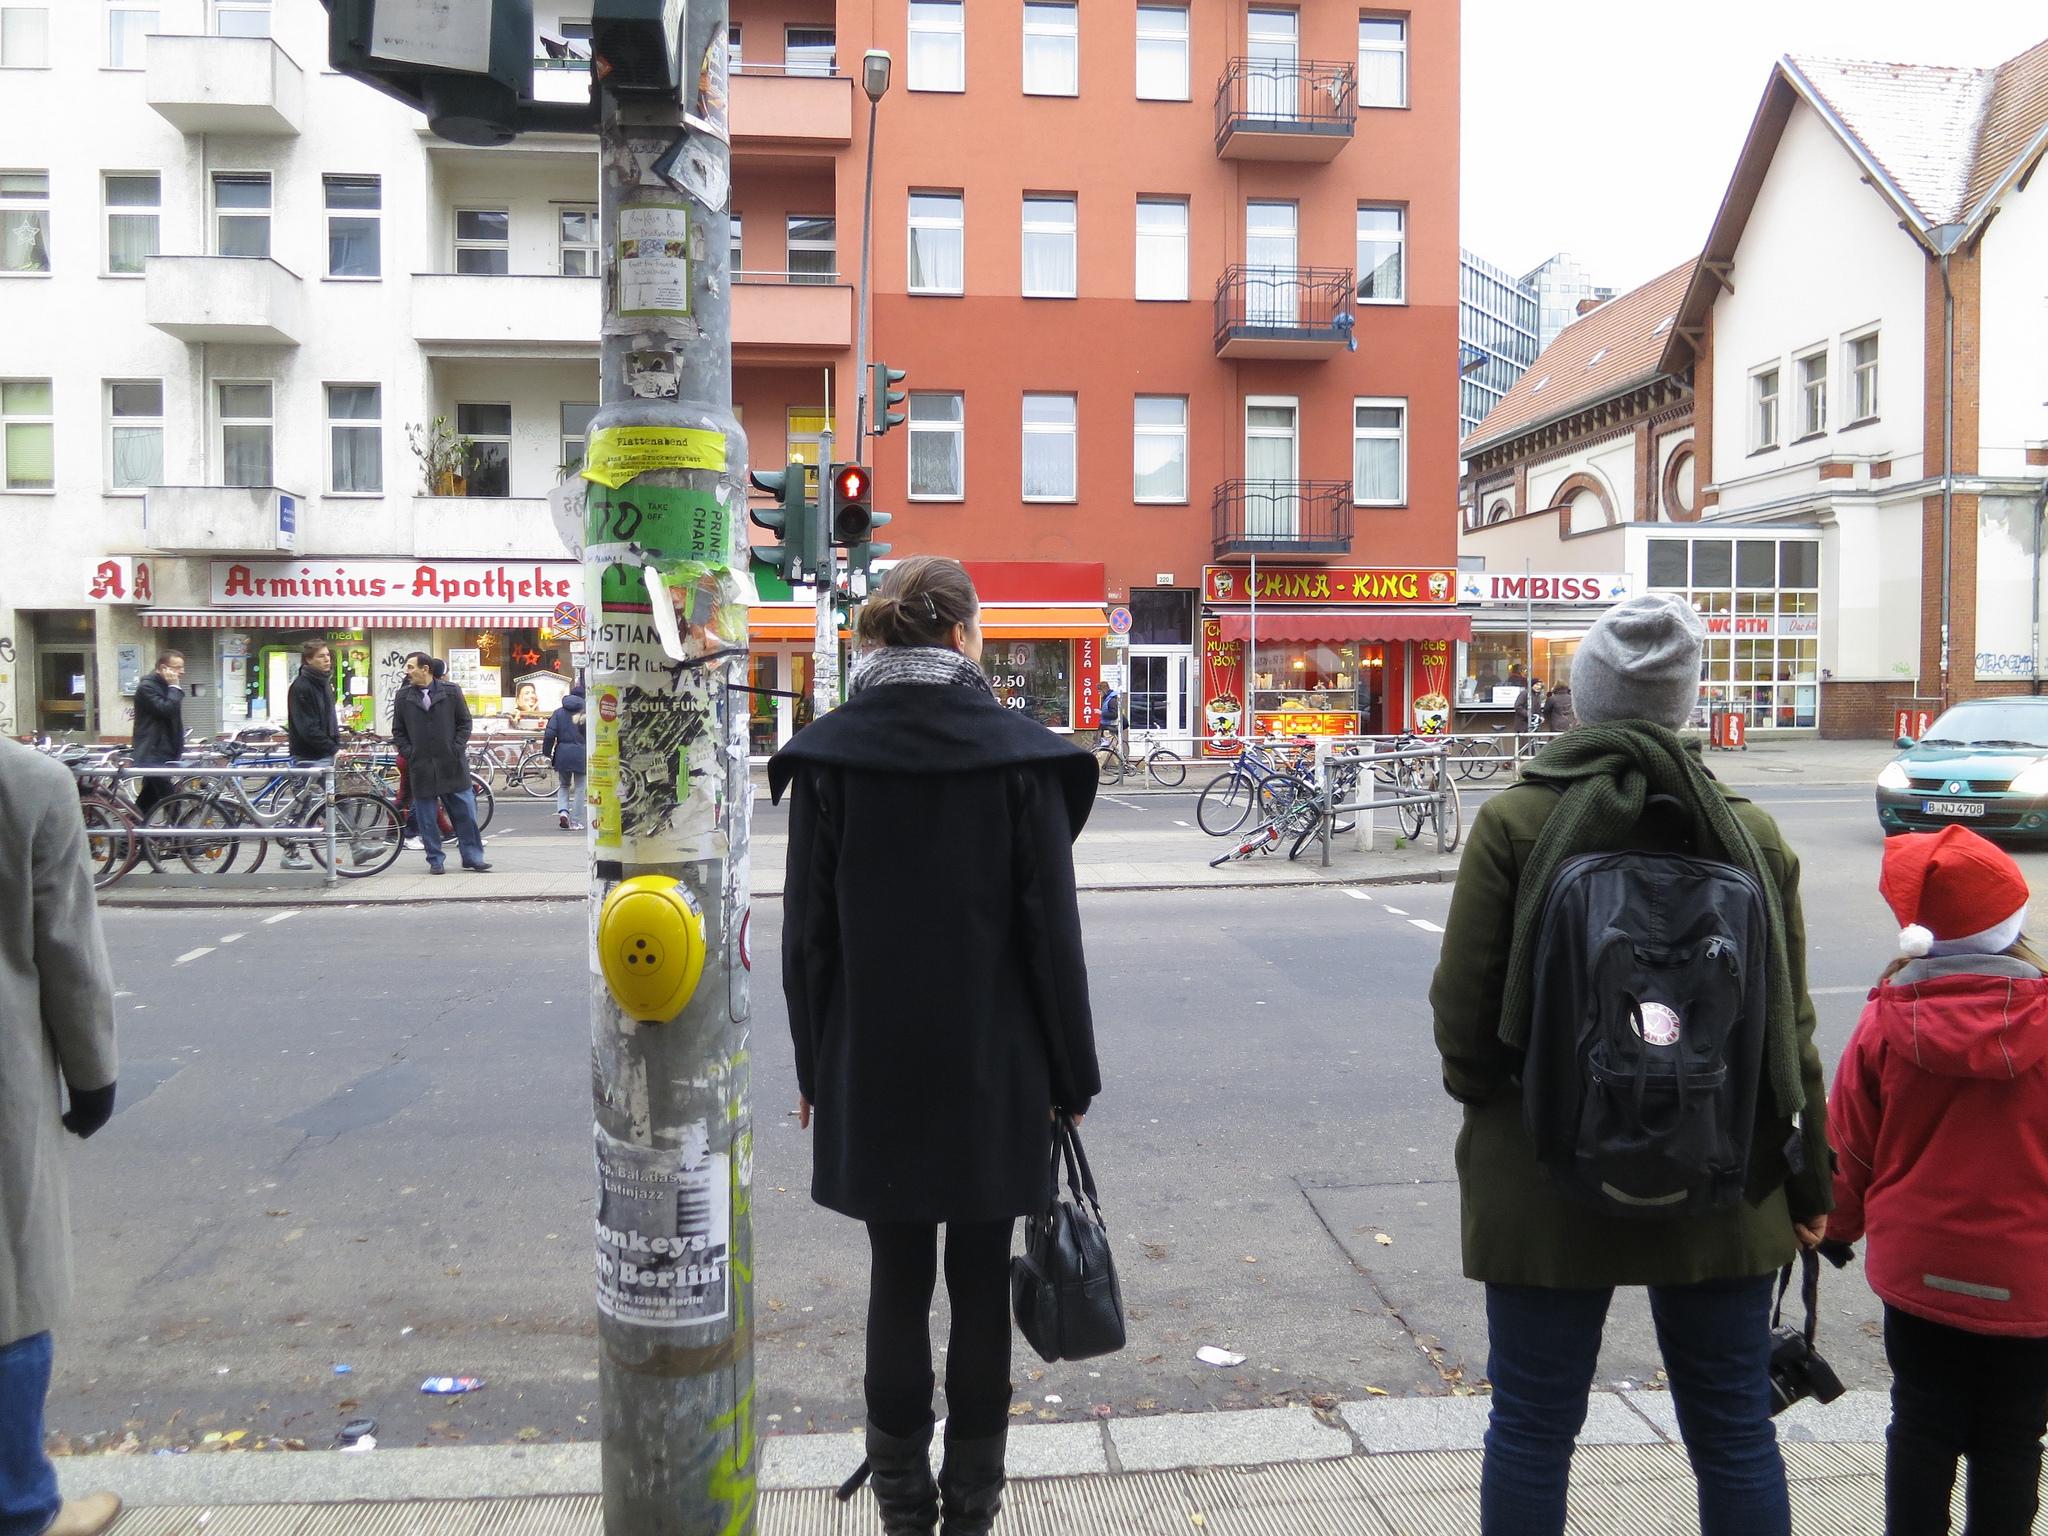 Crossing - Berlin